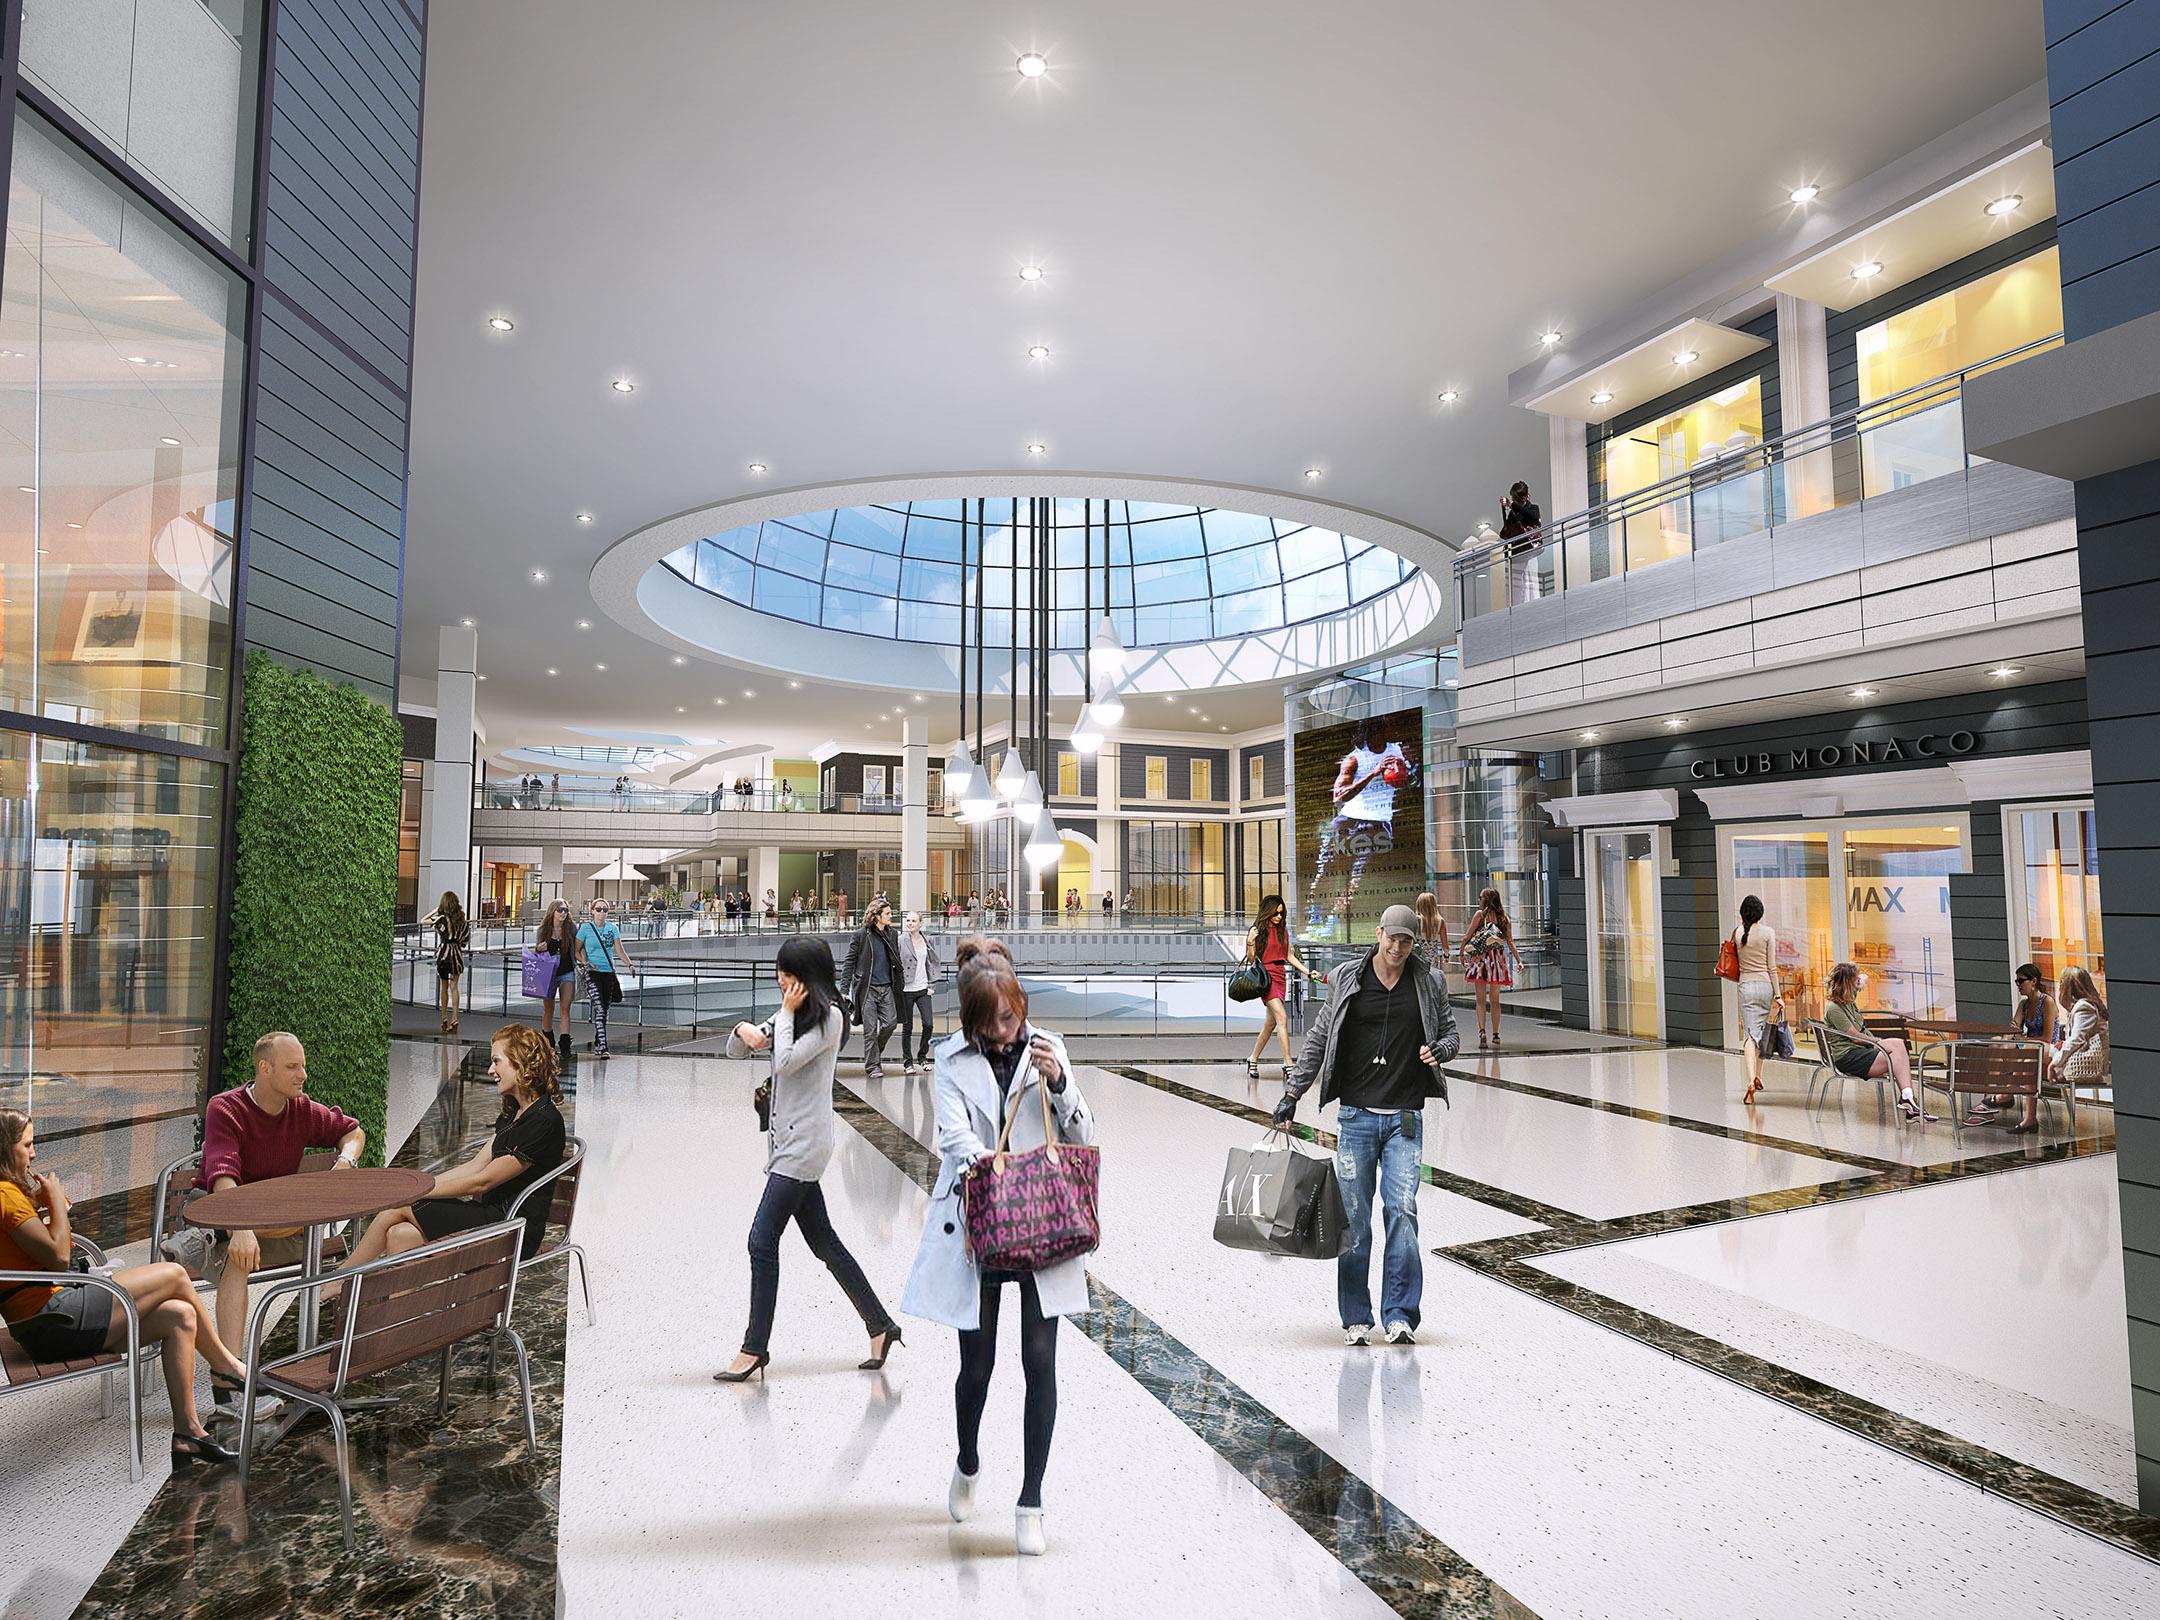 Warner Garden Mall